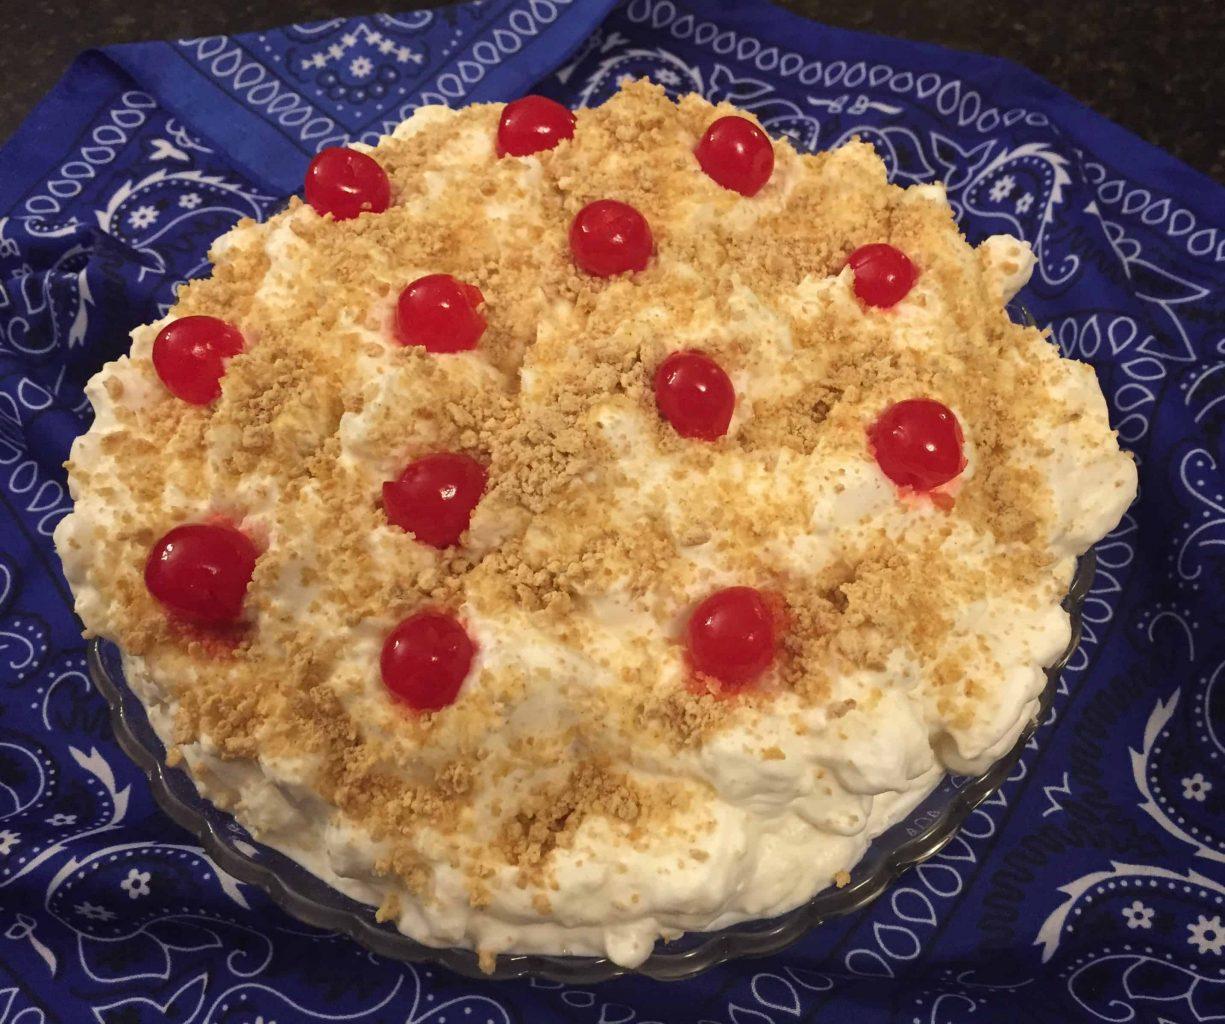 Whipped cream salad recipe